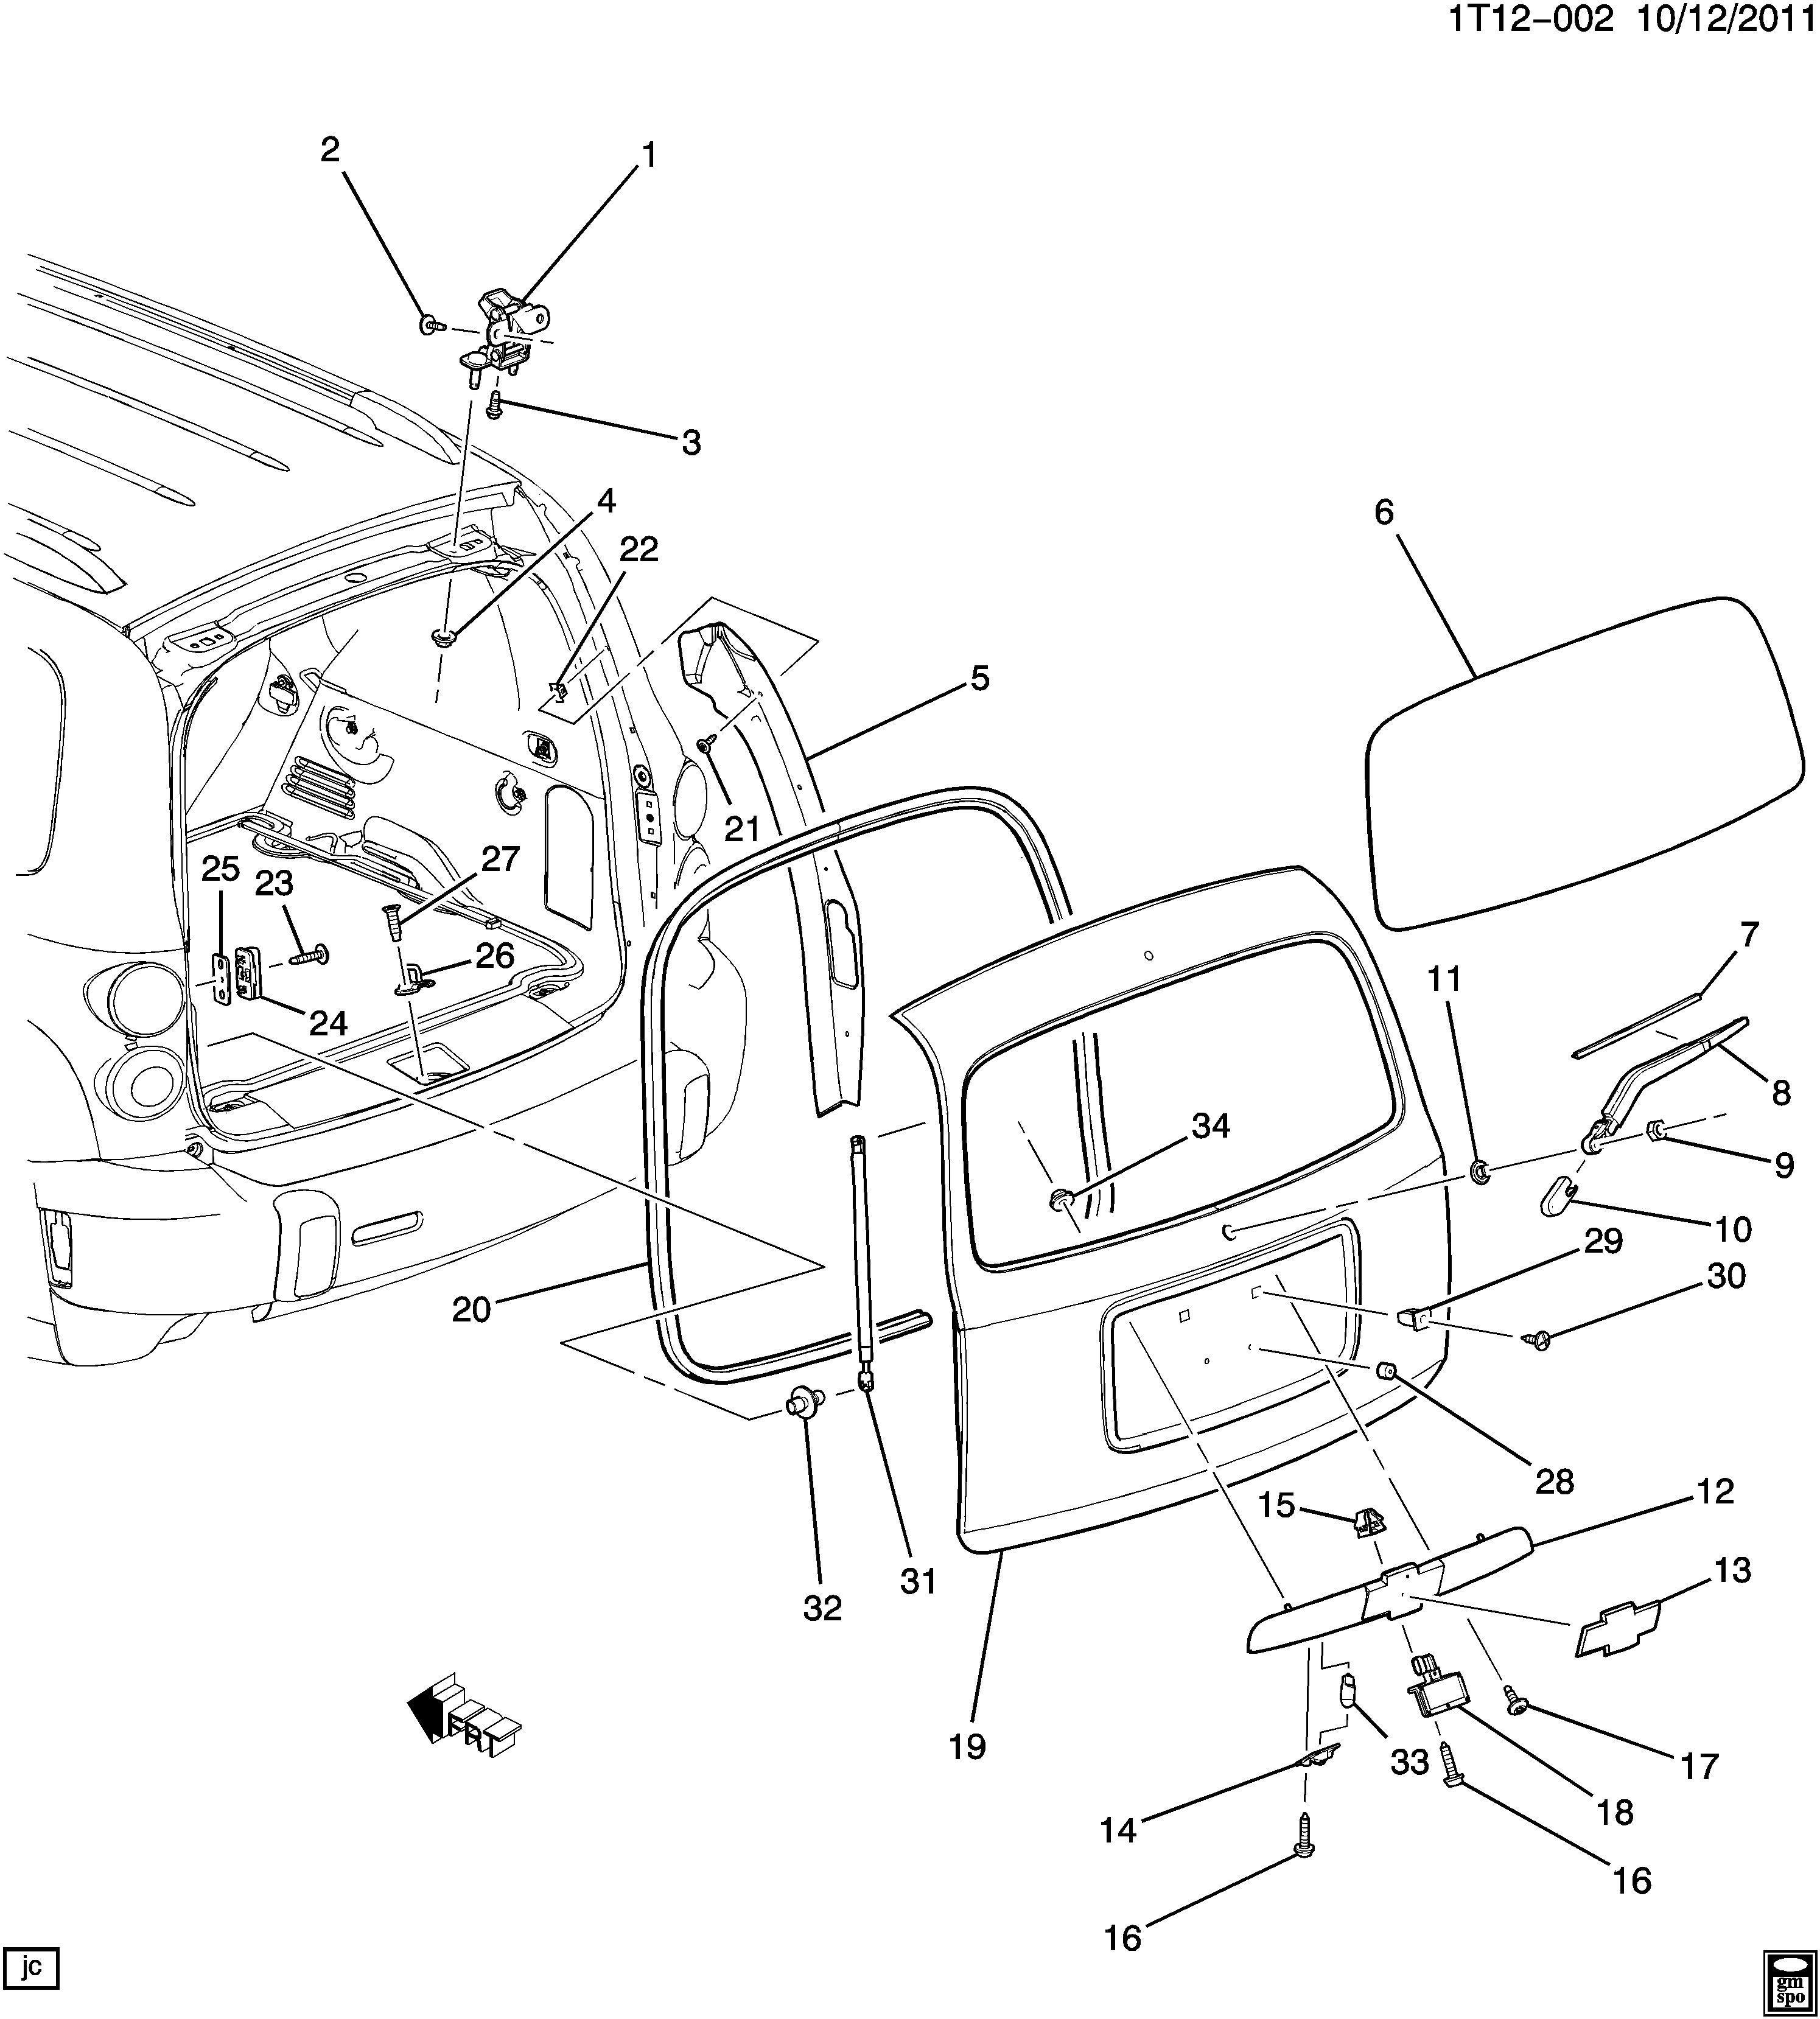 Chevy hhr parts diagram free download wiring diagrams